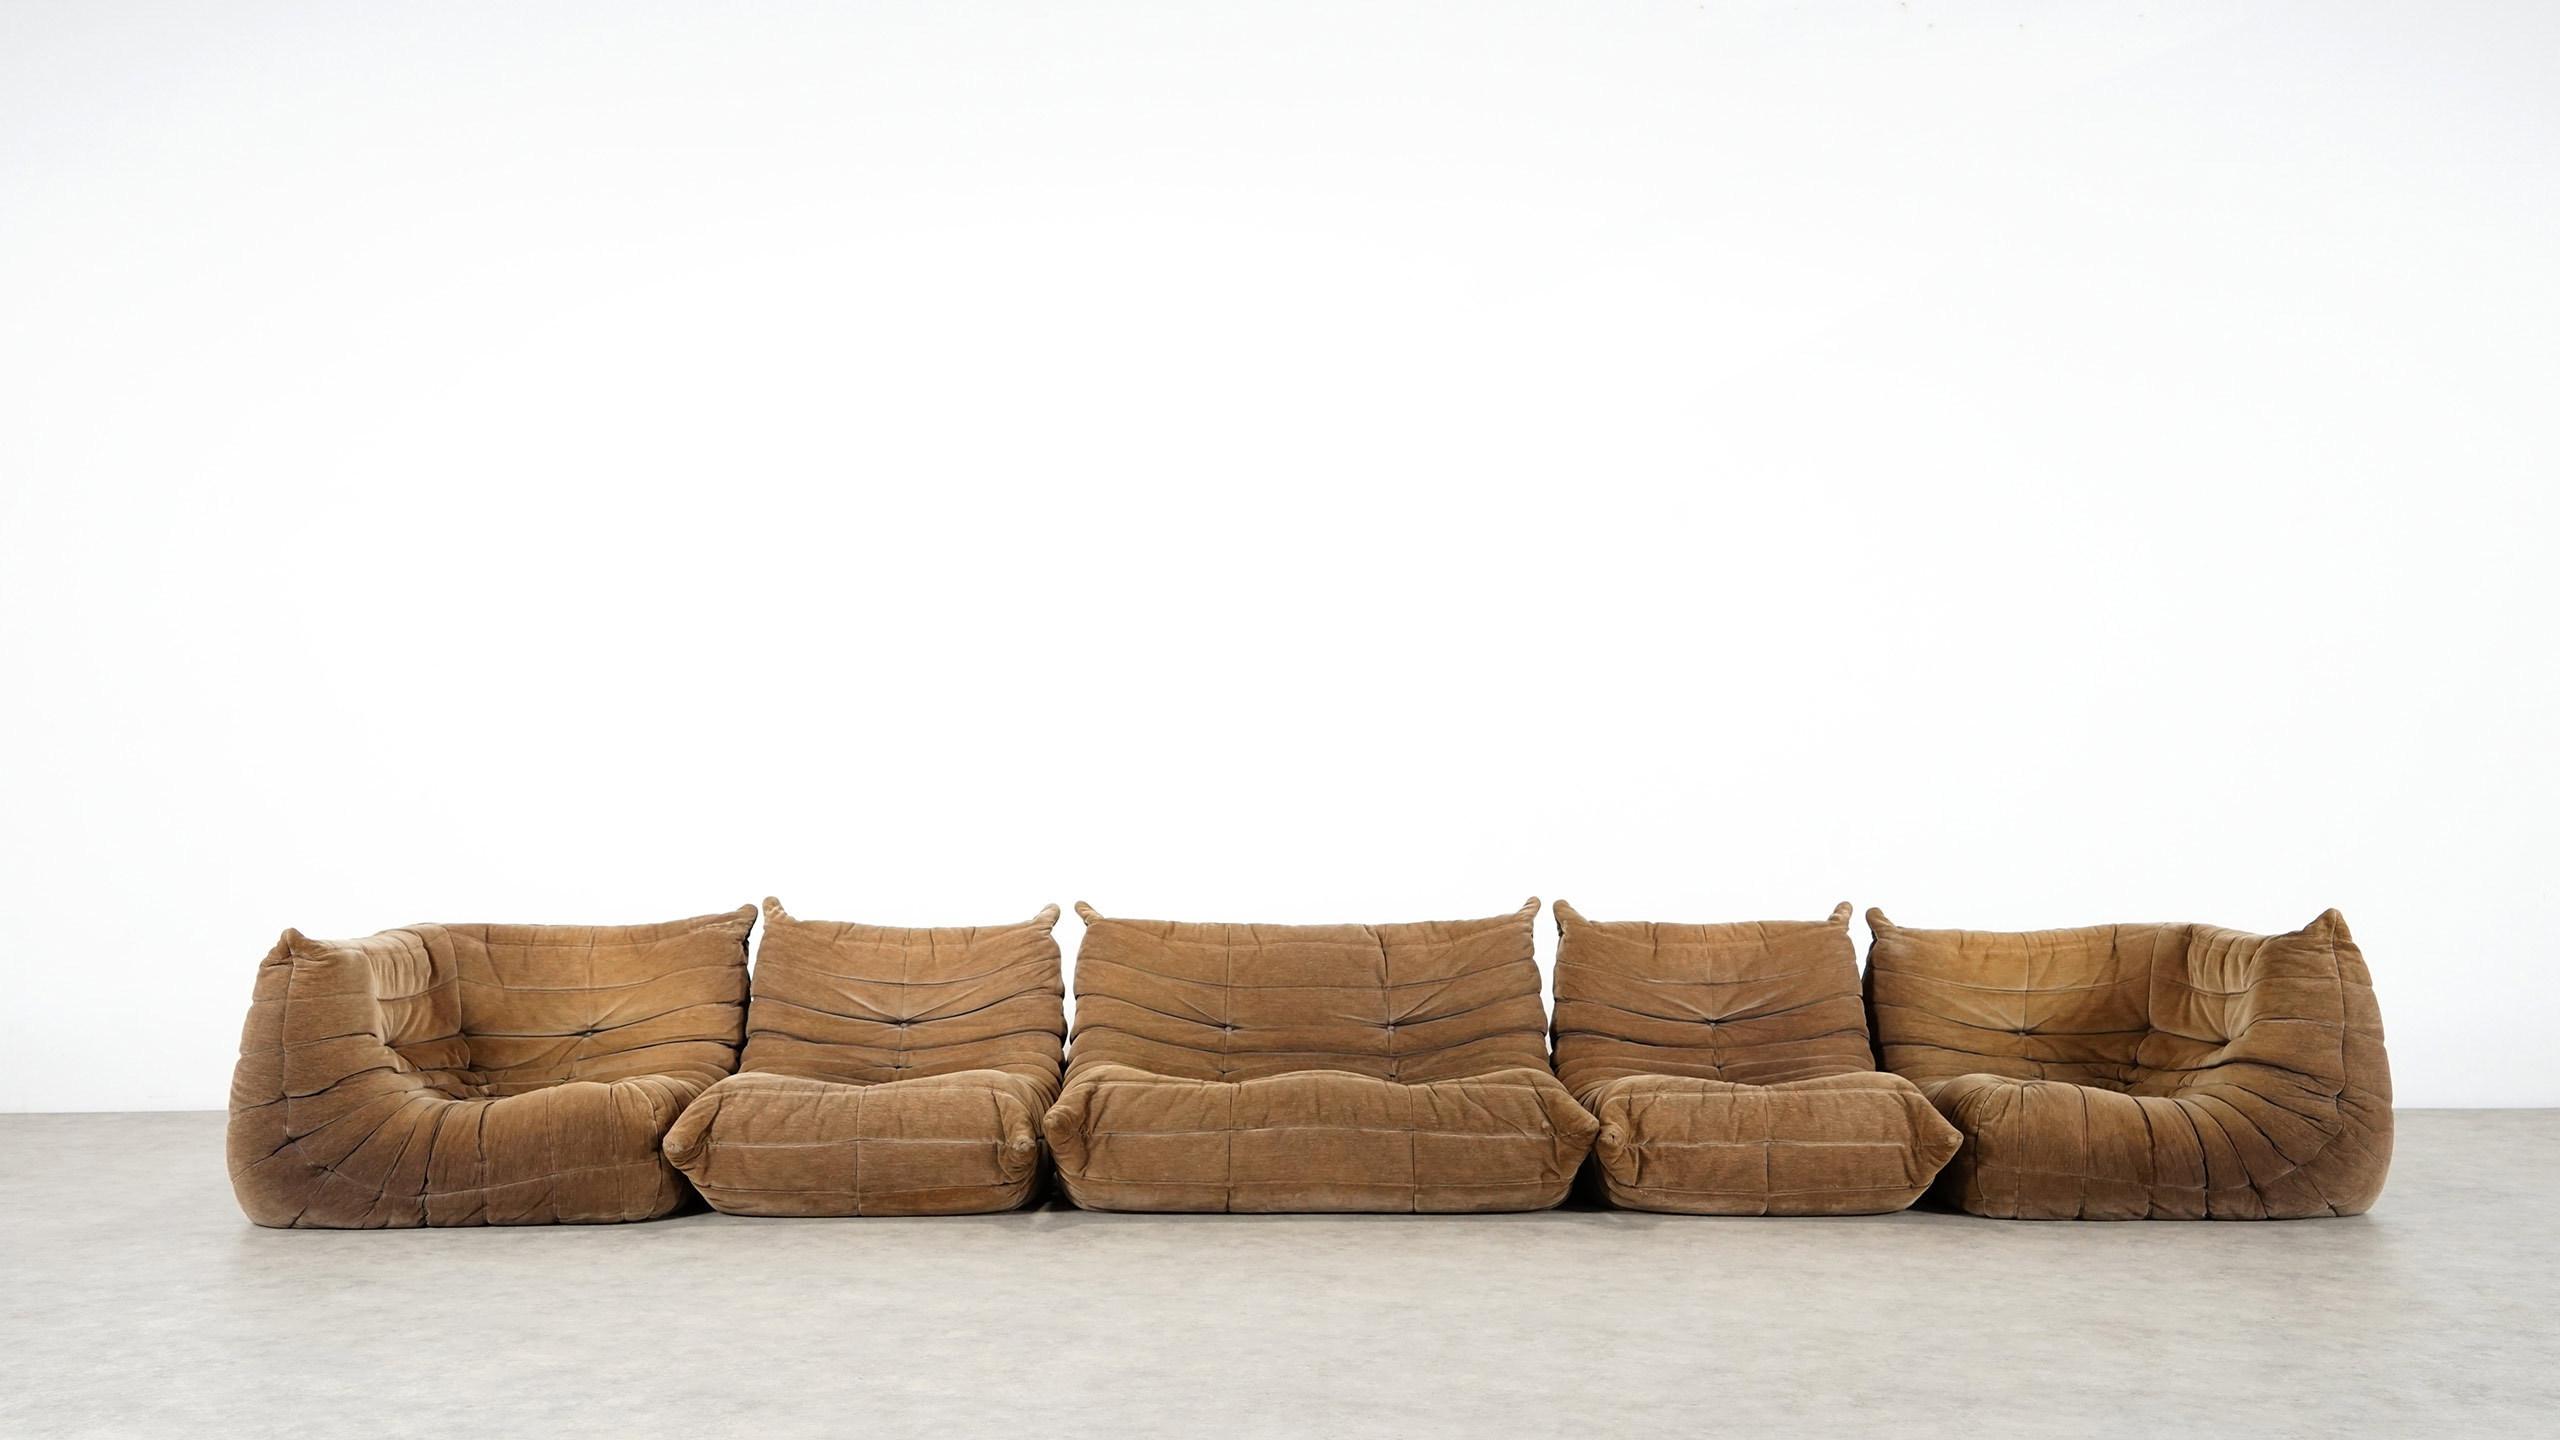 Full Size of Ligne Roset Togo Replica Uk Sessel Bezug Knockoff Sofa Cost Reproduction Preis Gebraucht Verkaufen Chair For Sale Dimensions By Michel Ducaroy Wohnzimmer Ligne Roset Togo